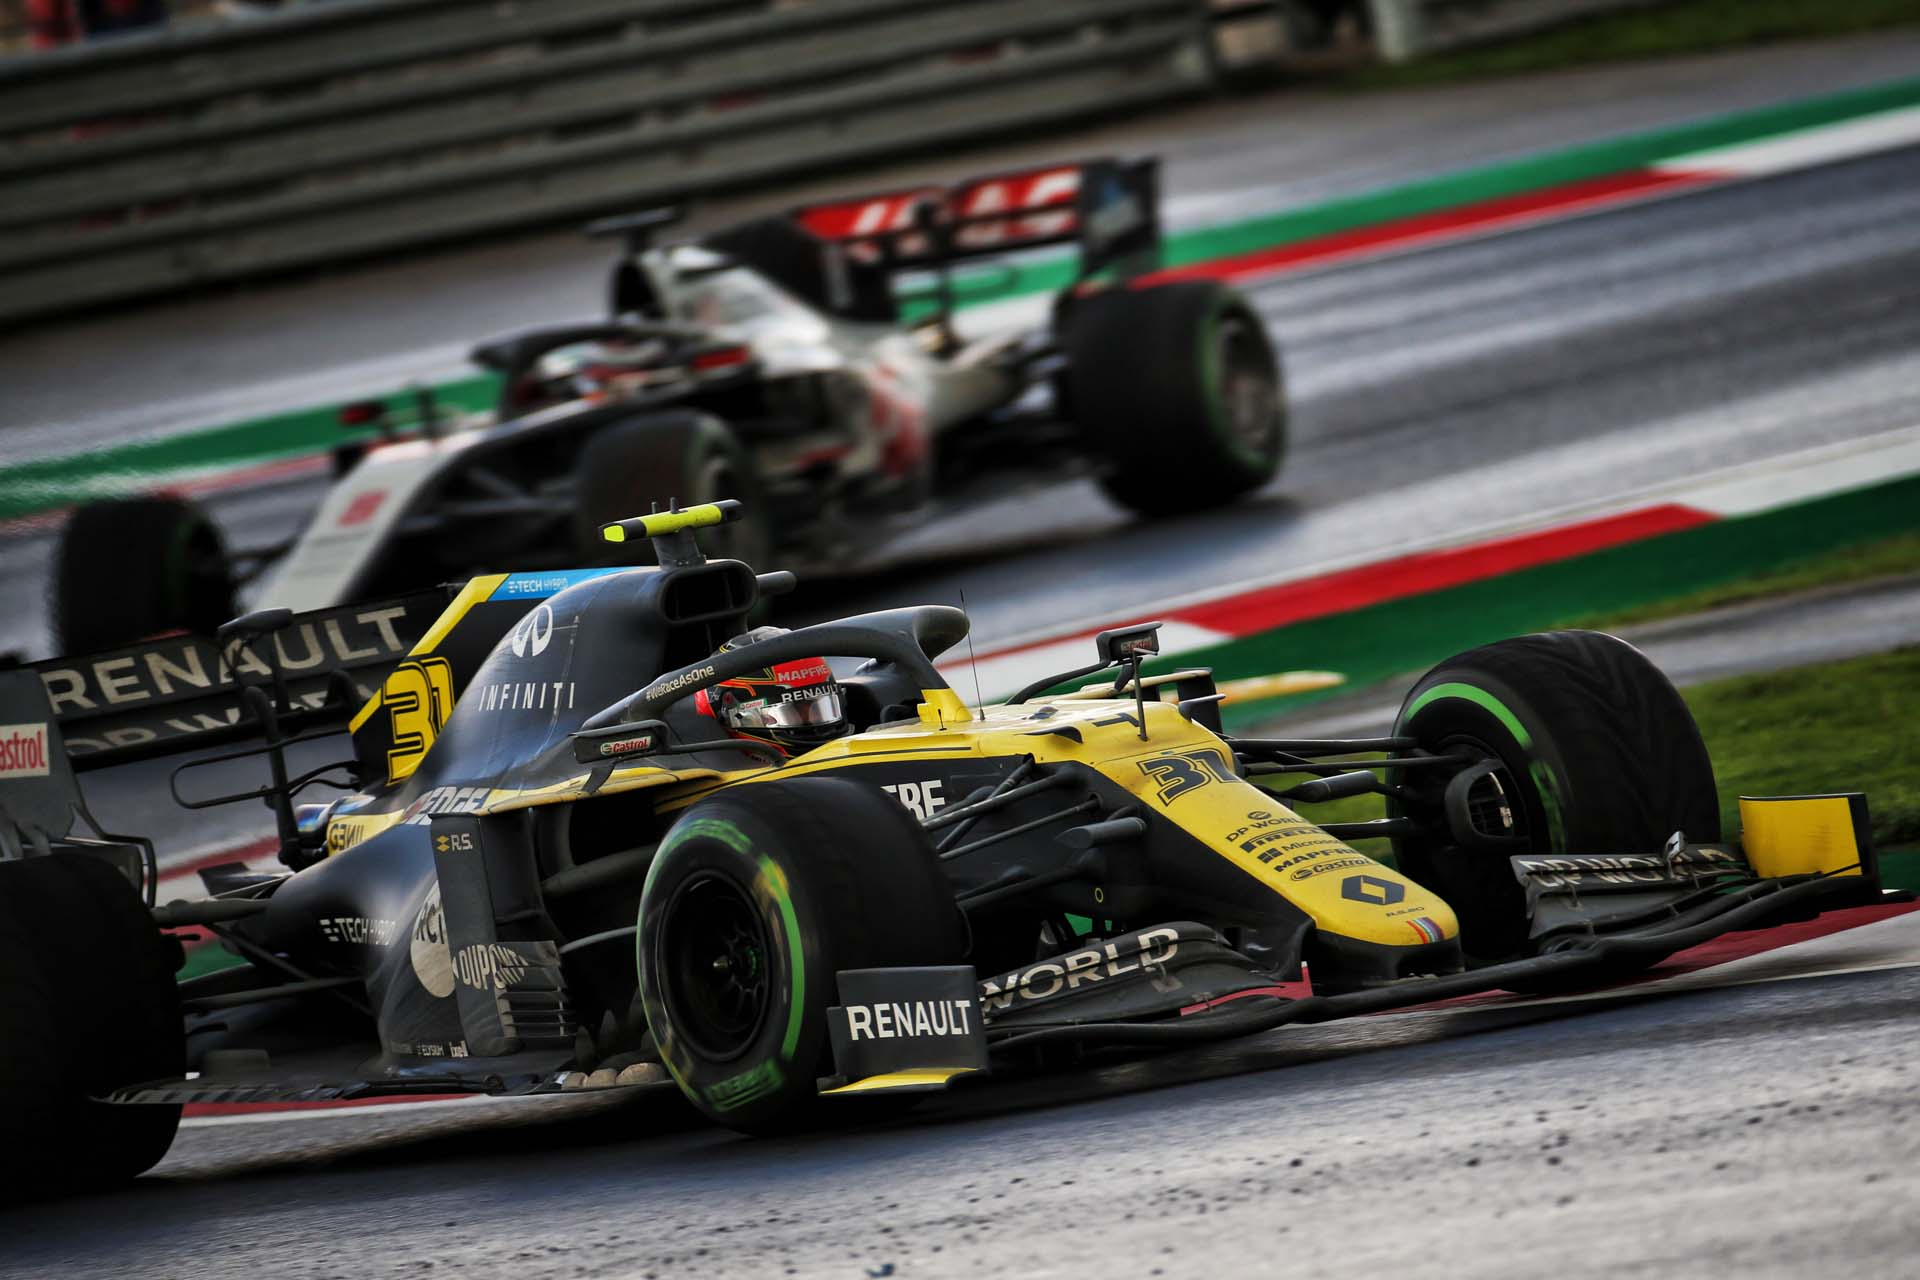 Motor Racing - Formula One World Championship - Turkish Grand Prix - Race Day - Istanbul, Turkey